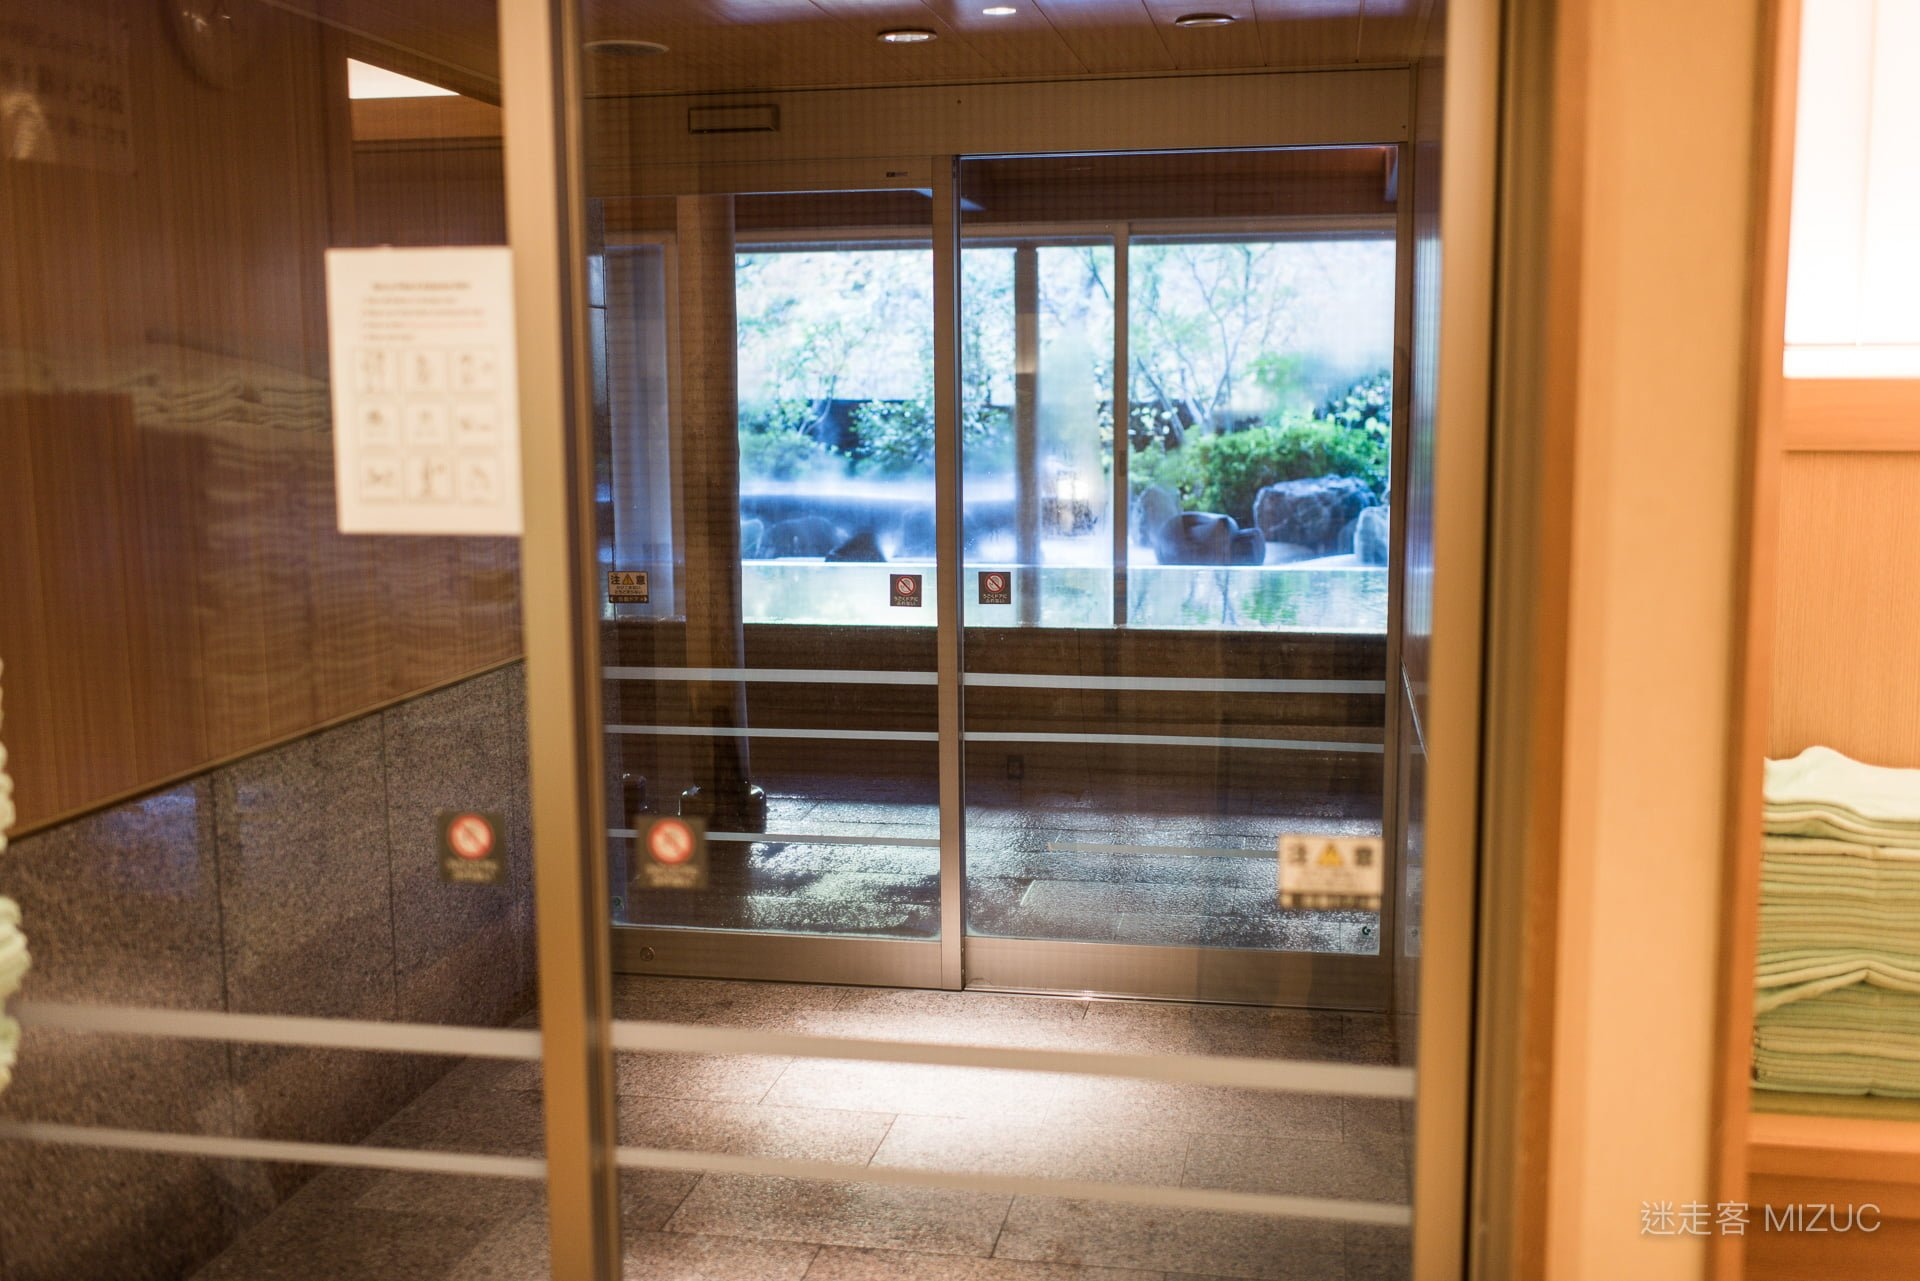 201711 Ibaraki Tochigi Gunma Japan Travel By RentalCar 48 日本自駕旅遊/北關東三縣「茨城、櫪木、群馬」秋天美食、溫泉與瀑布秘境百景(精選照片分享)